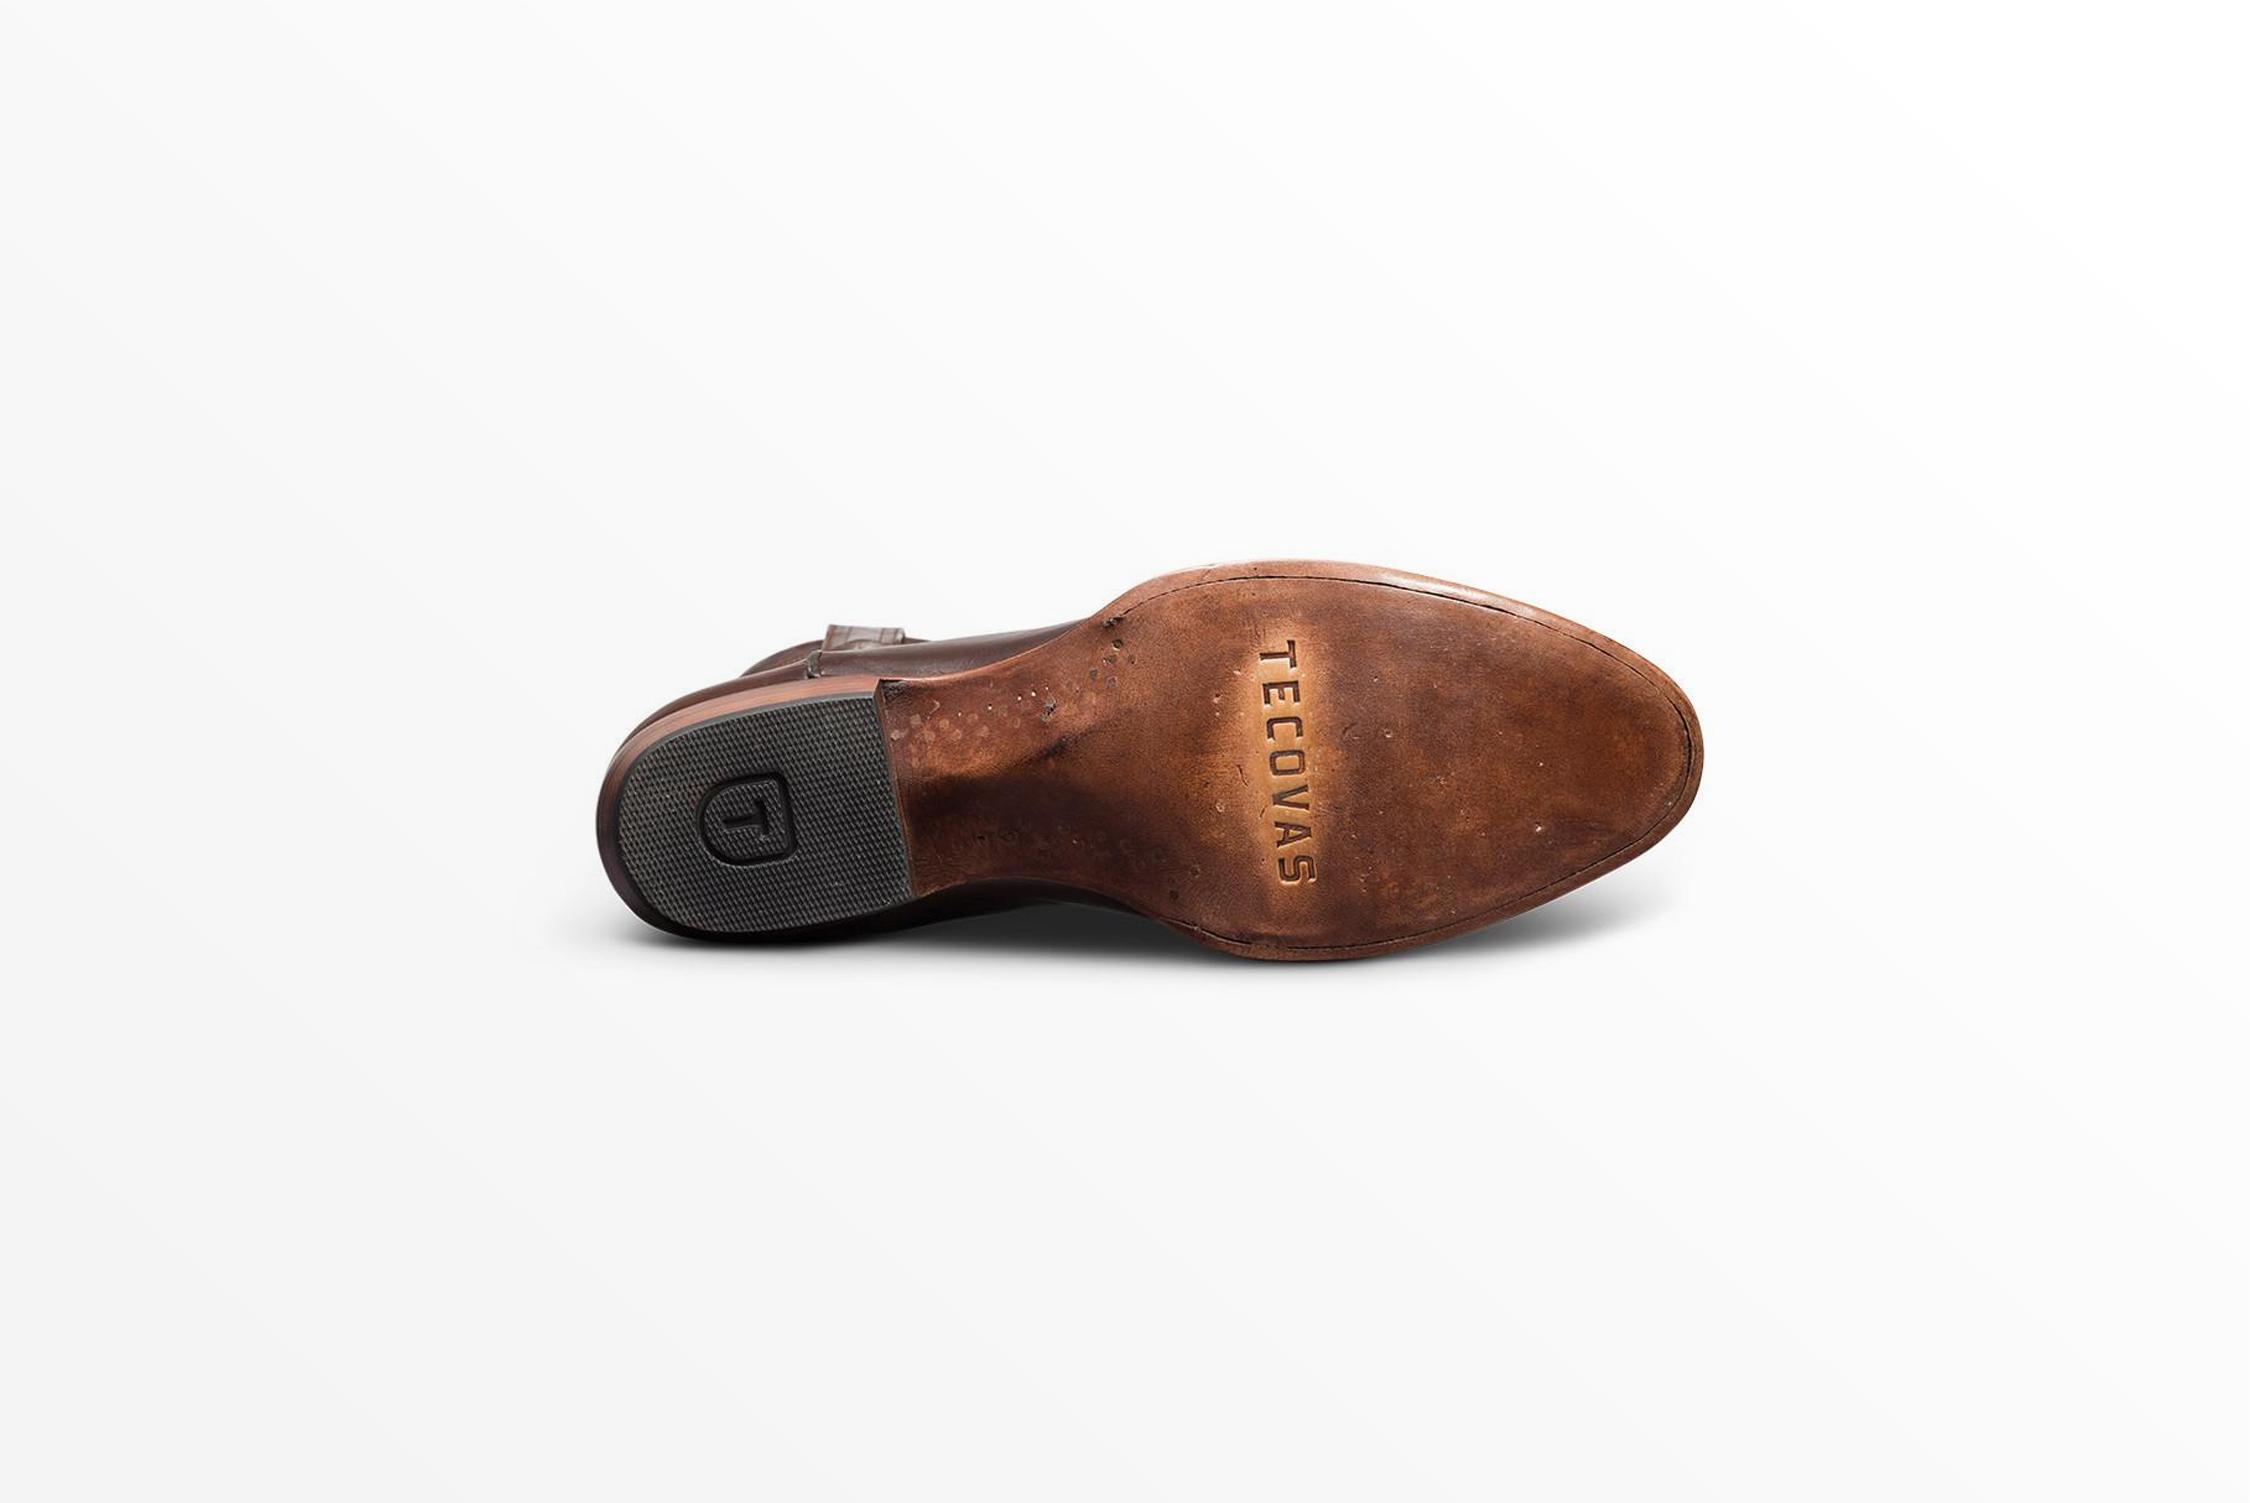 Tecovas Boots - Cartwright